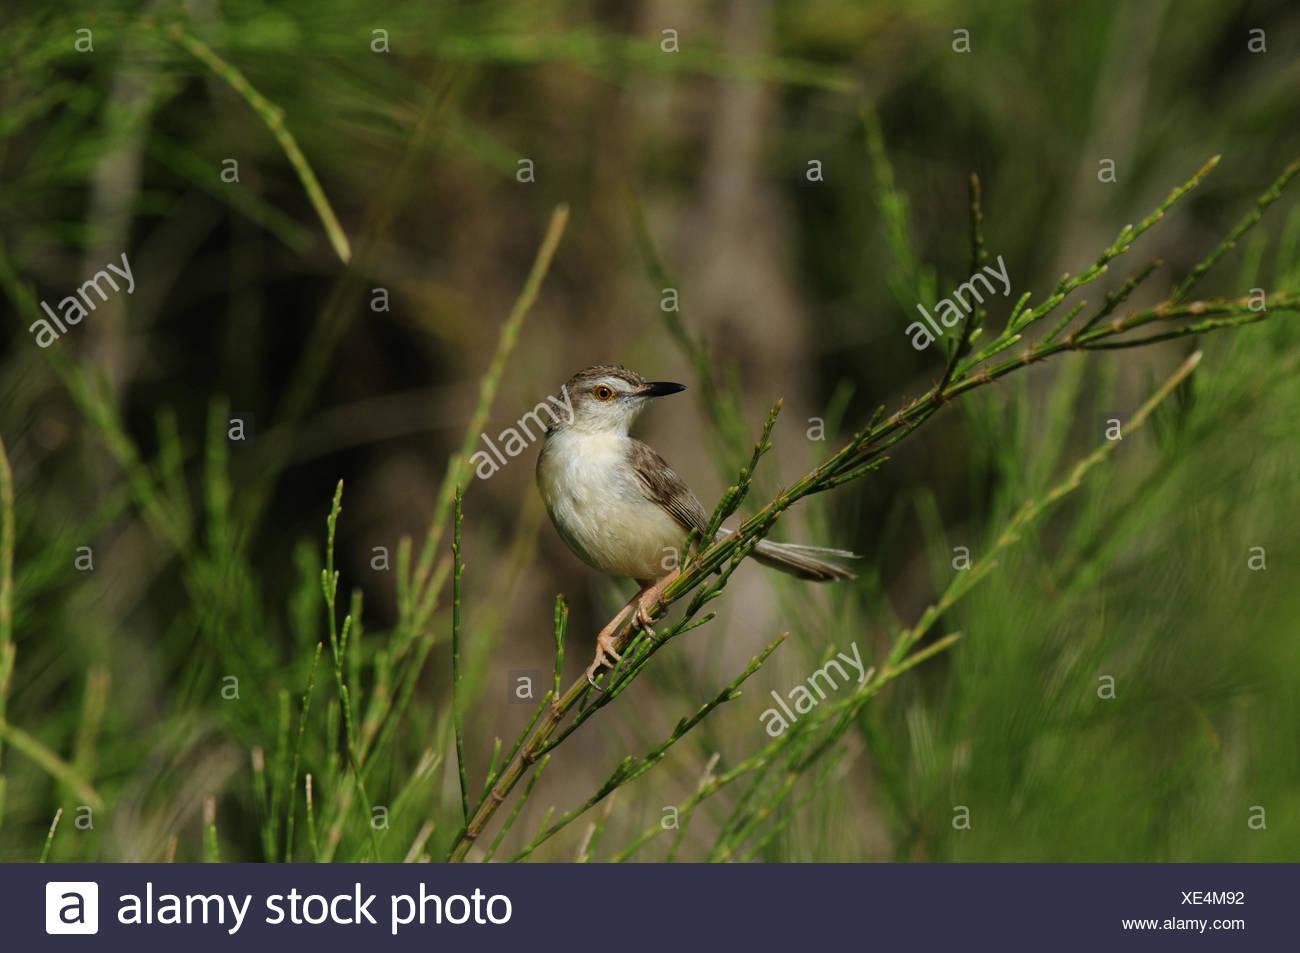 White-browed Pirnia (Prinia inornata insularis), sitting on a branch, Sri Lanka - Stock Image